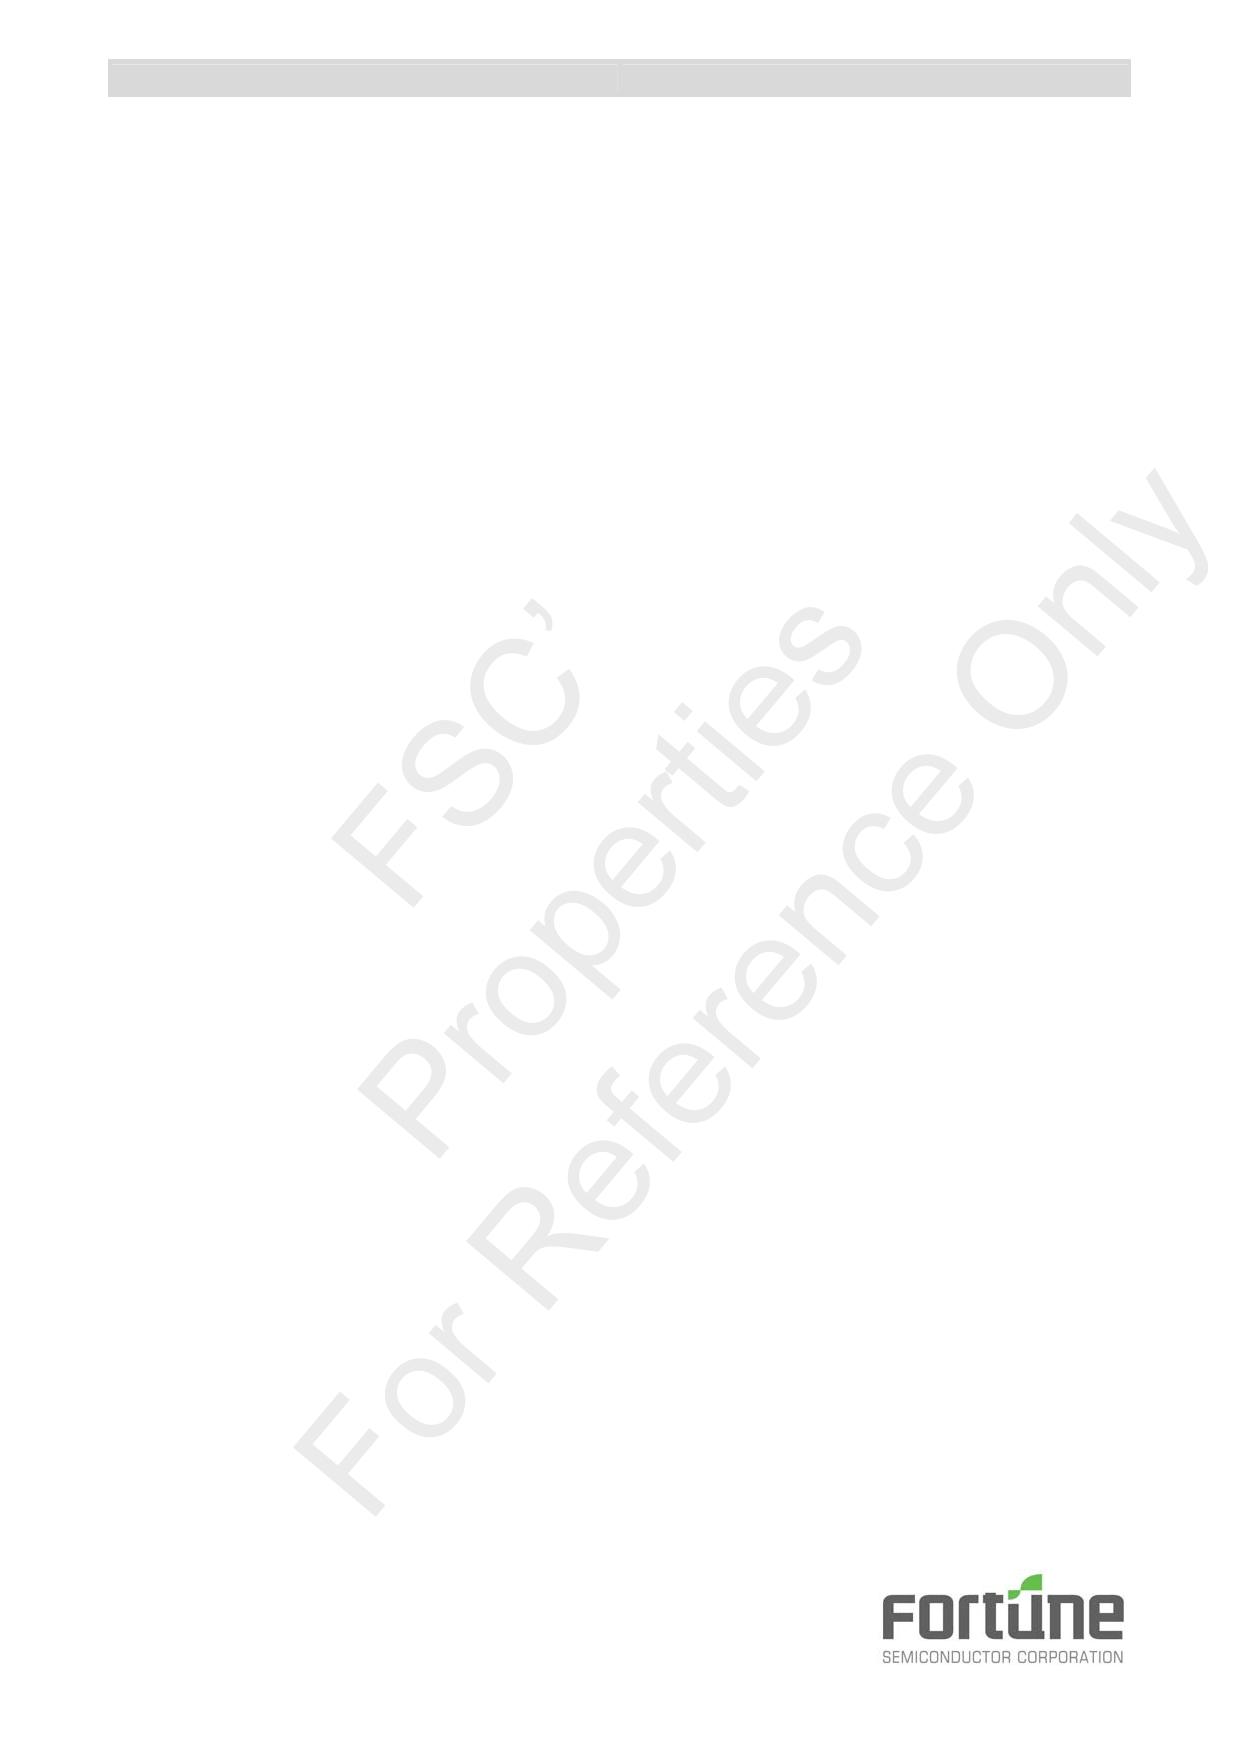 FS9952-LP1 datasheet